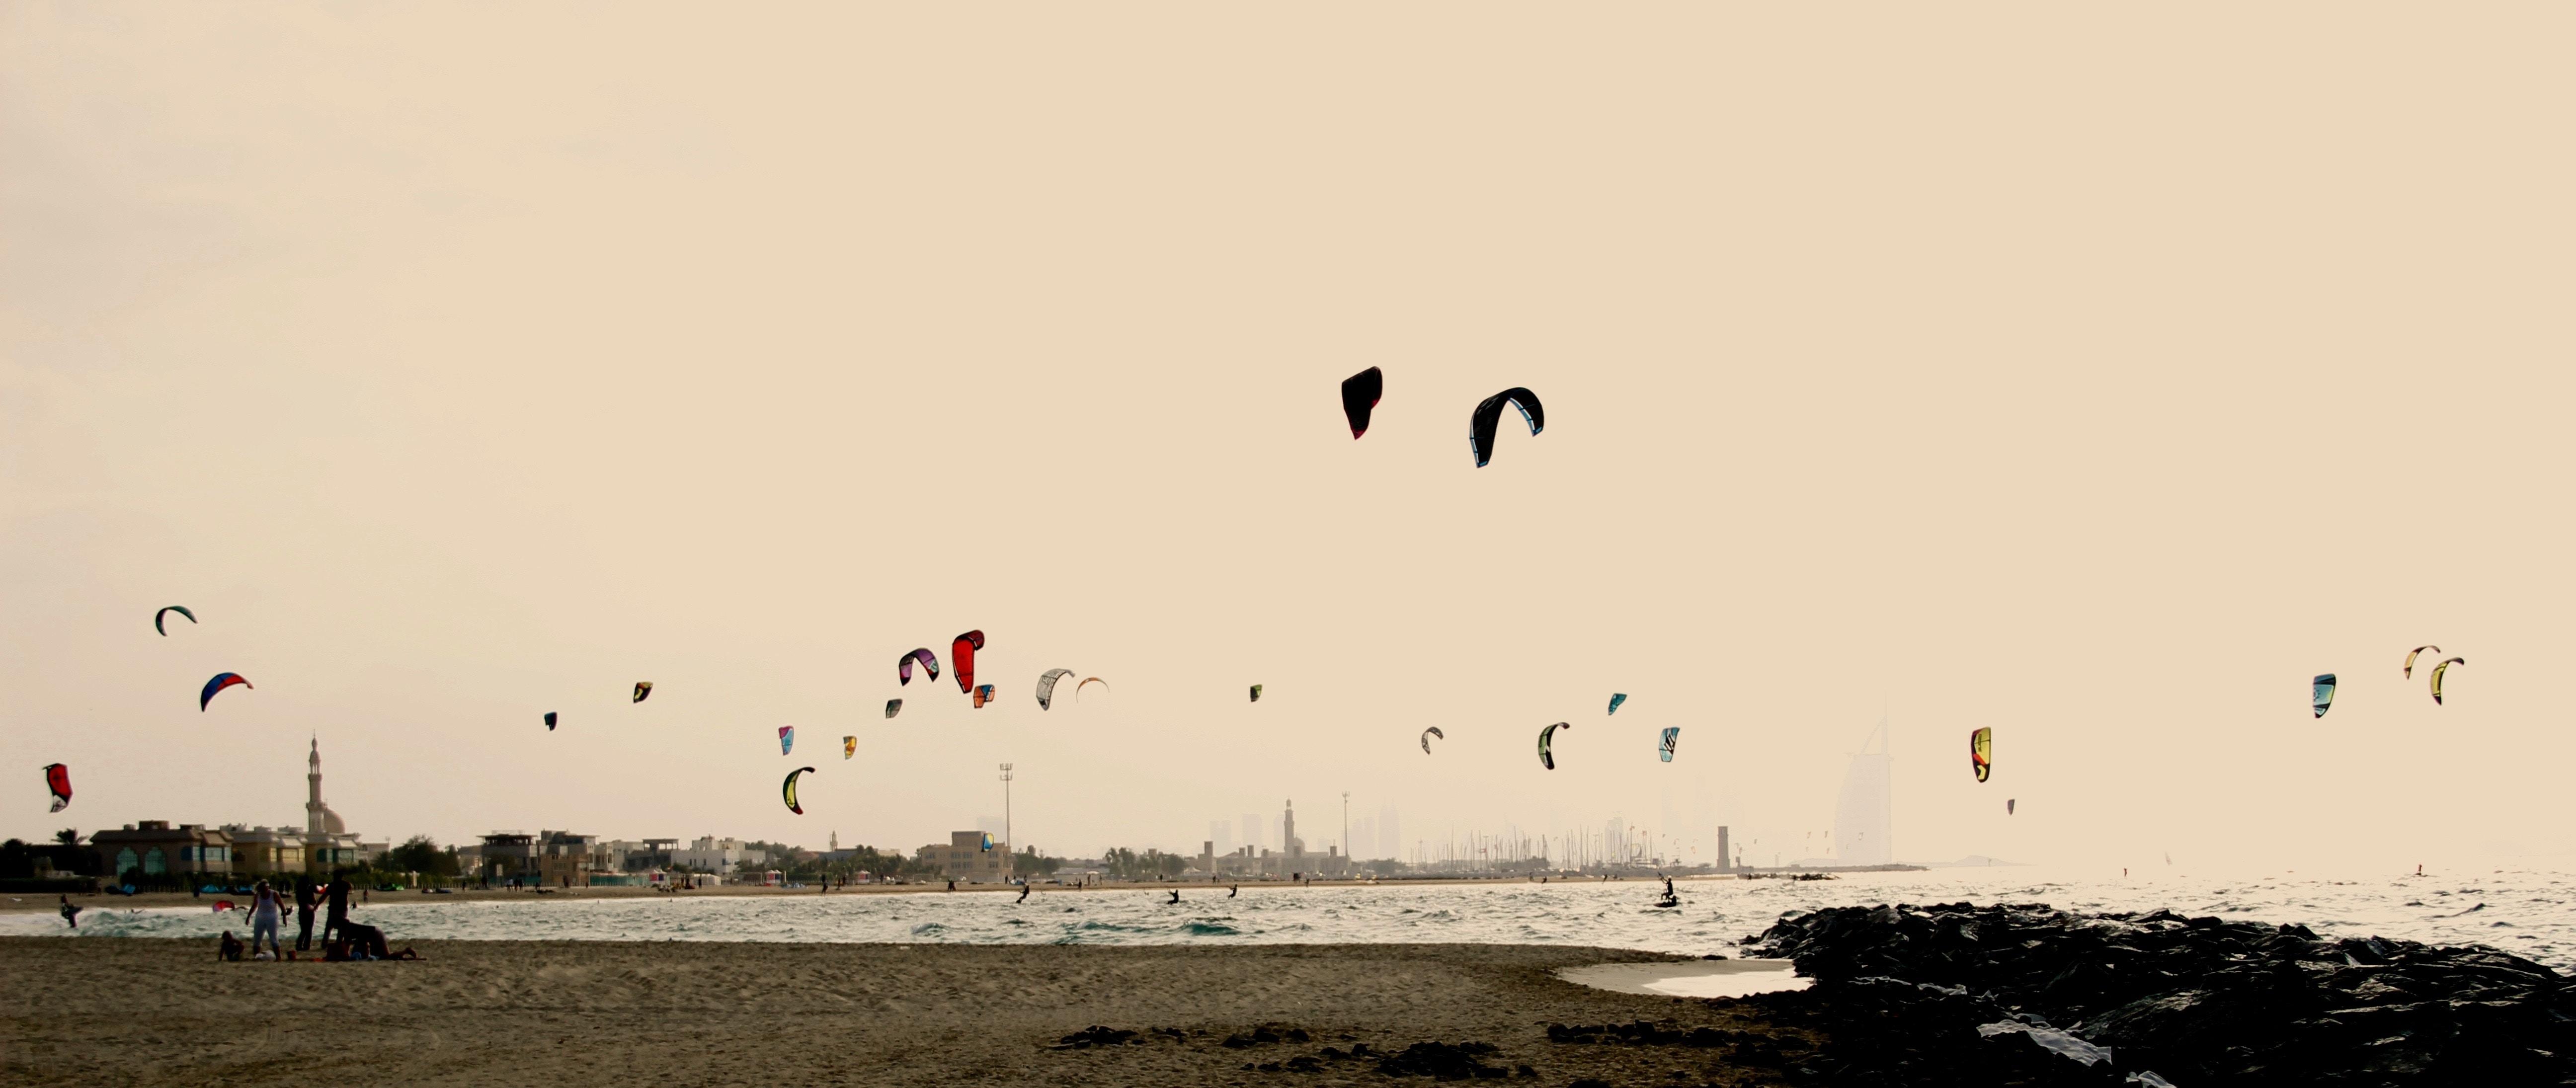 flock of flying birds long exposure photography